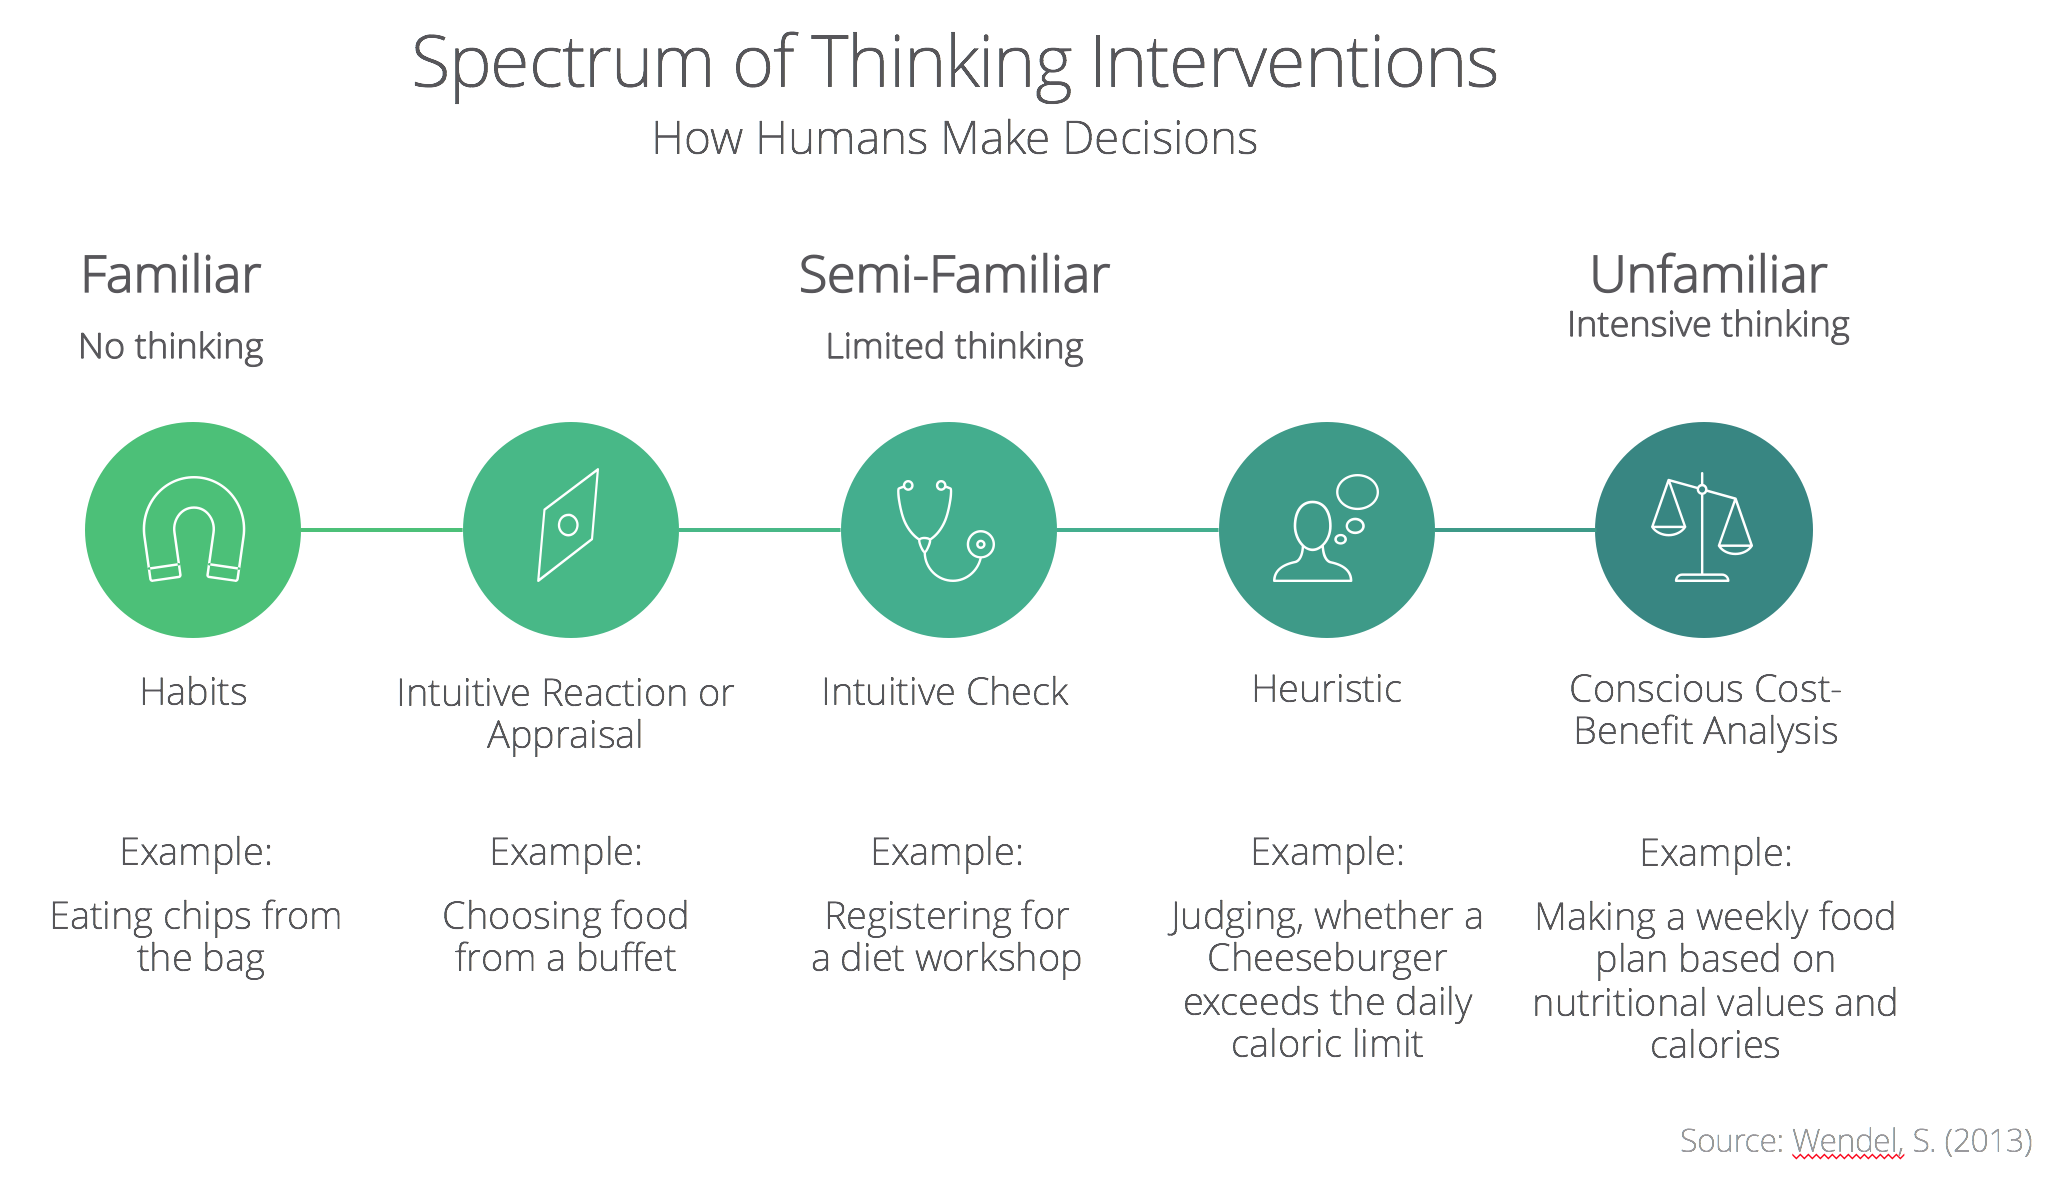 Spectrum of Thinking Interventions